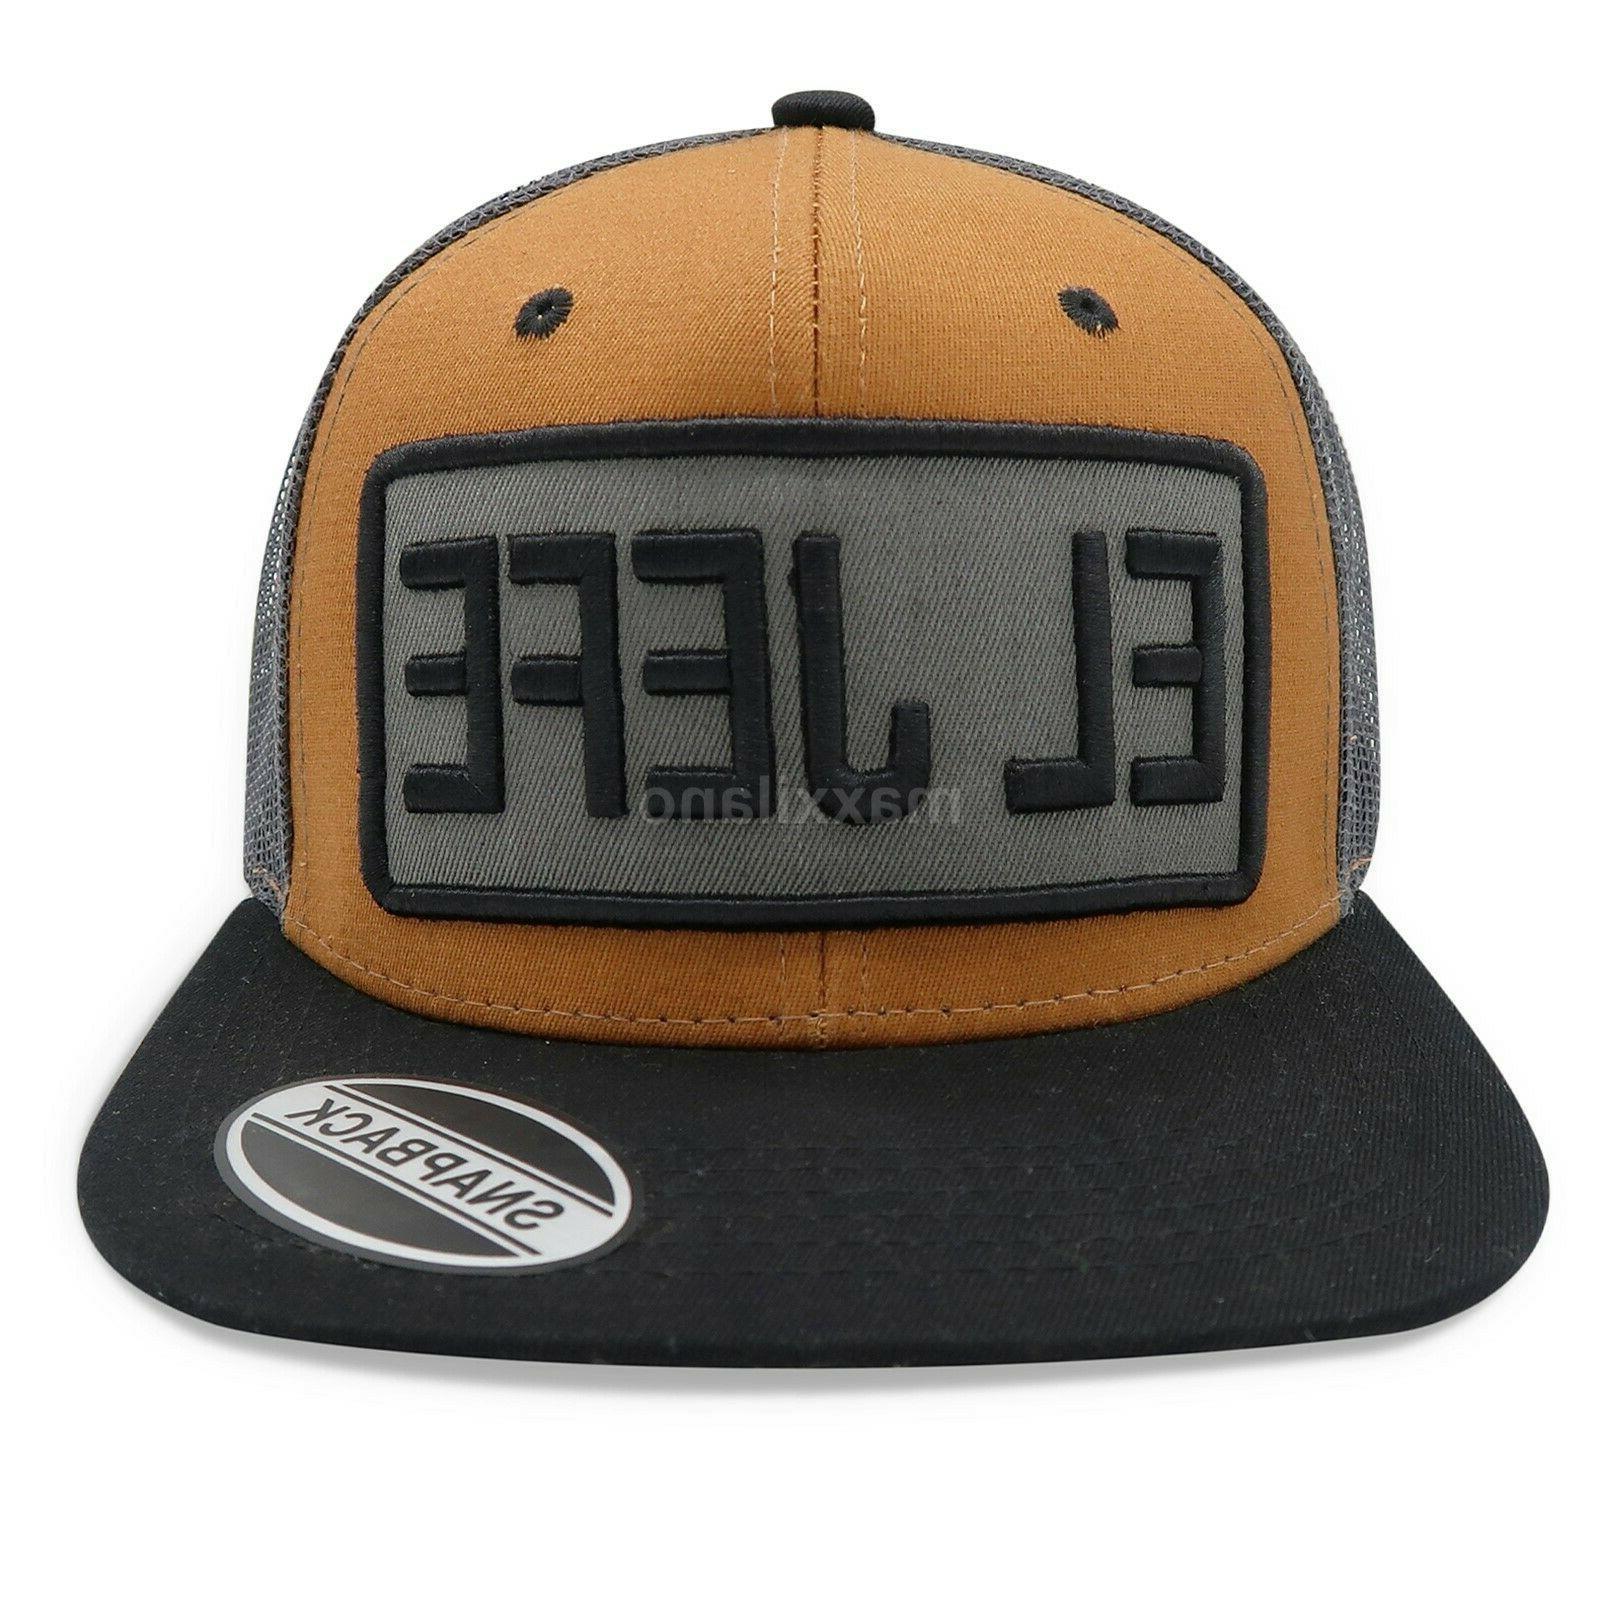 Mens Snapback Mesh Hat Adjustable Trucker Hats Flat Cap Hop Style